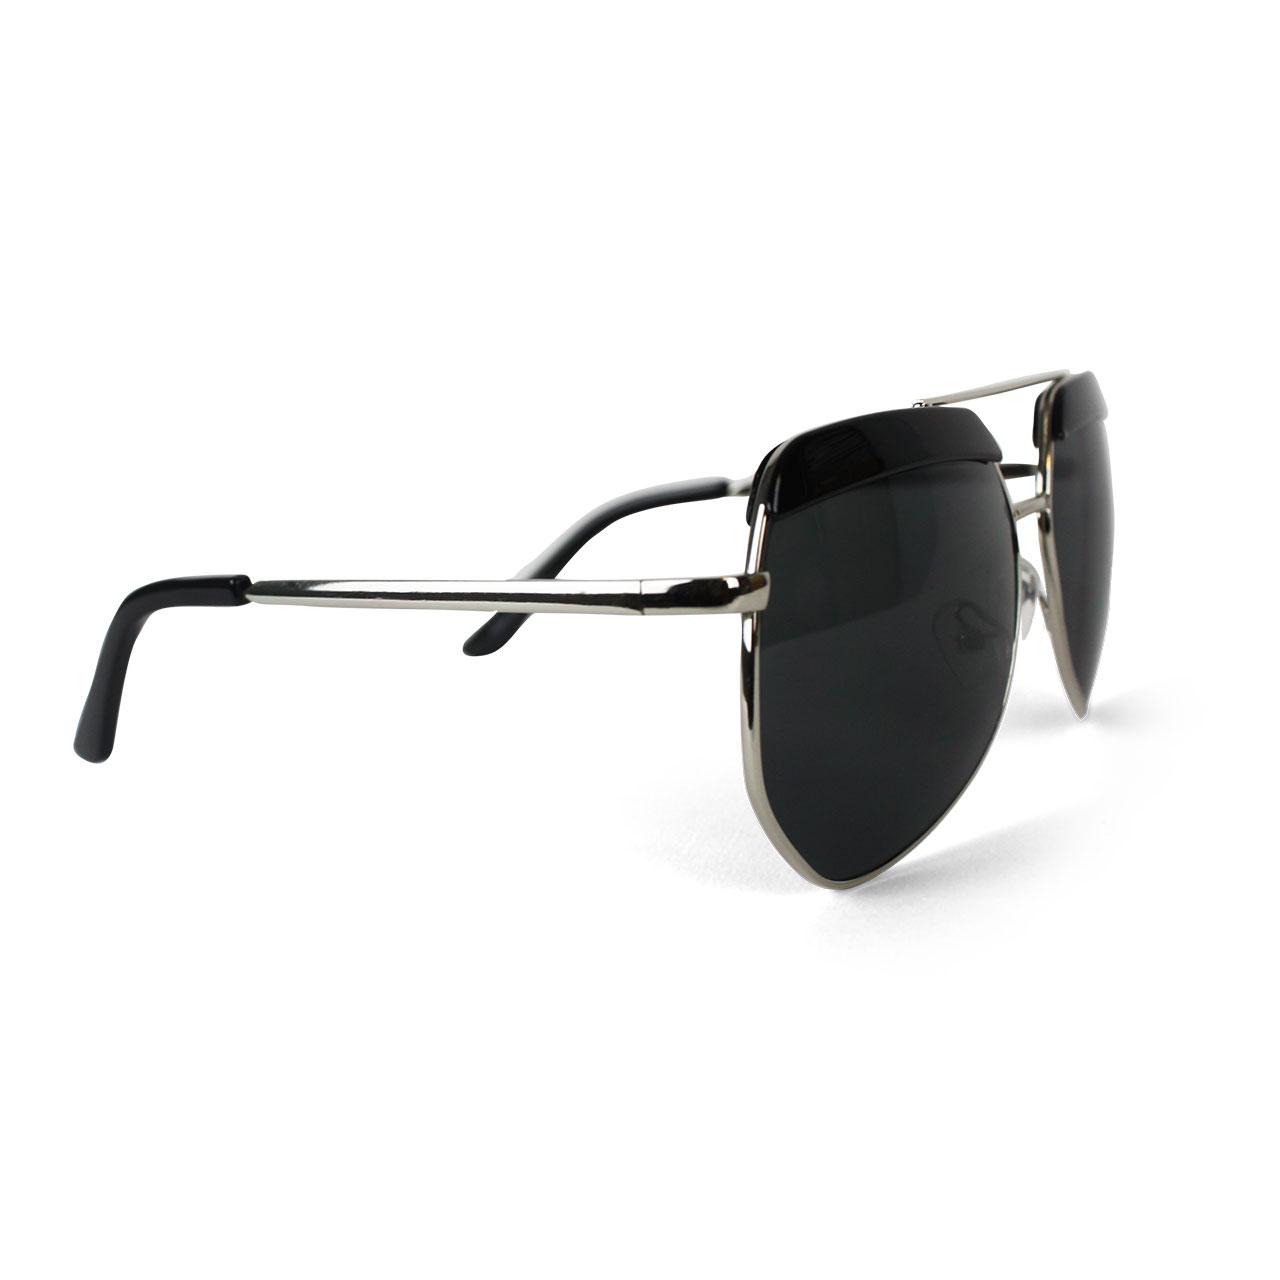 Men's UV Protected Black Tinted Aviator Sunglasses